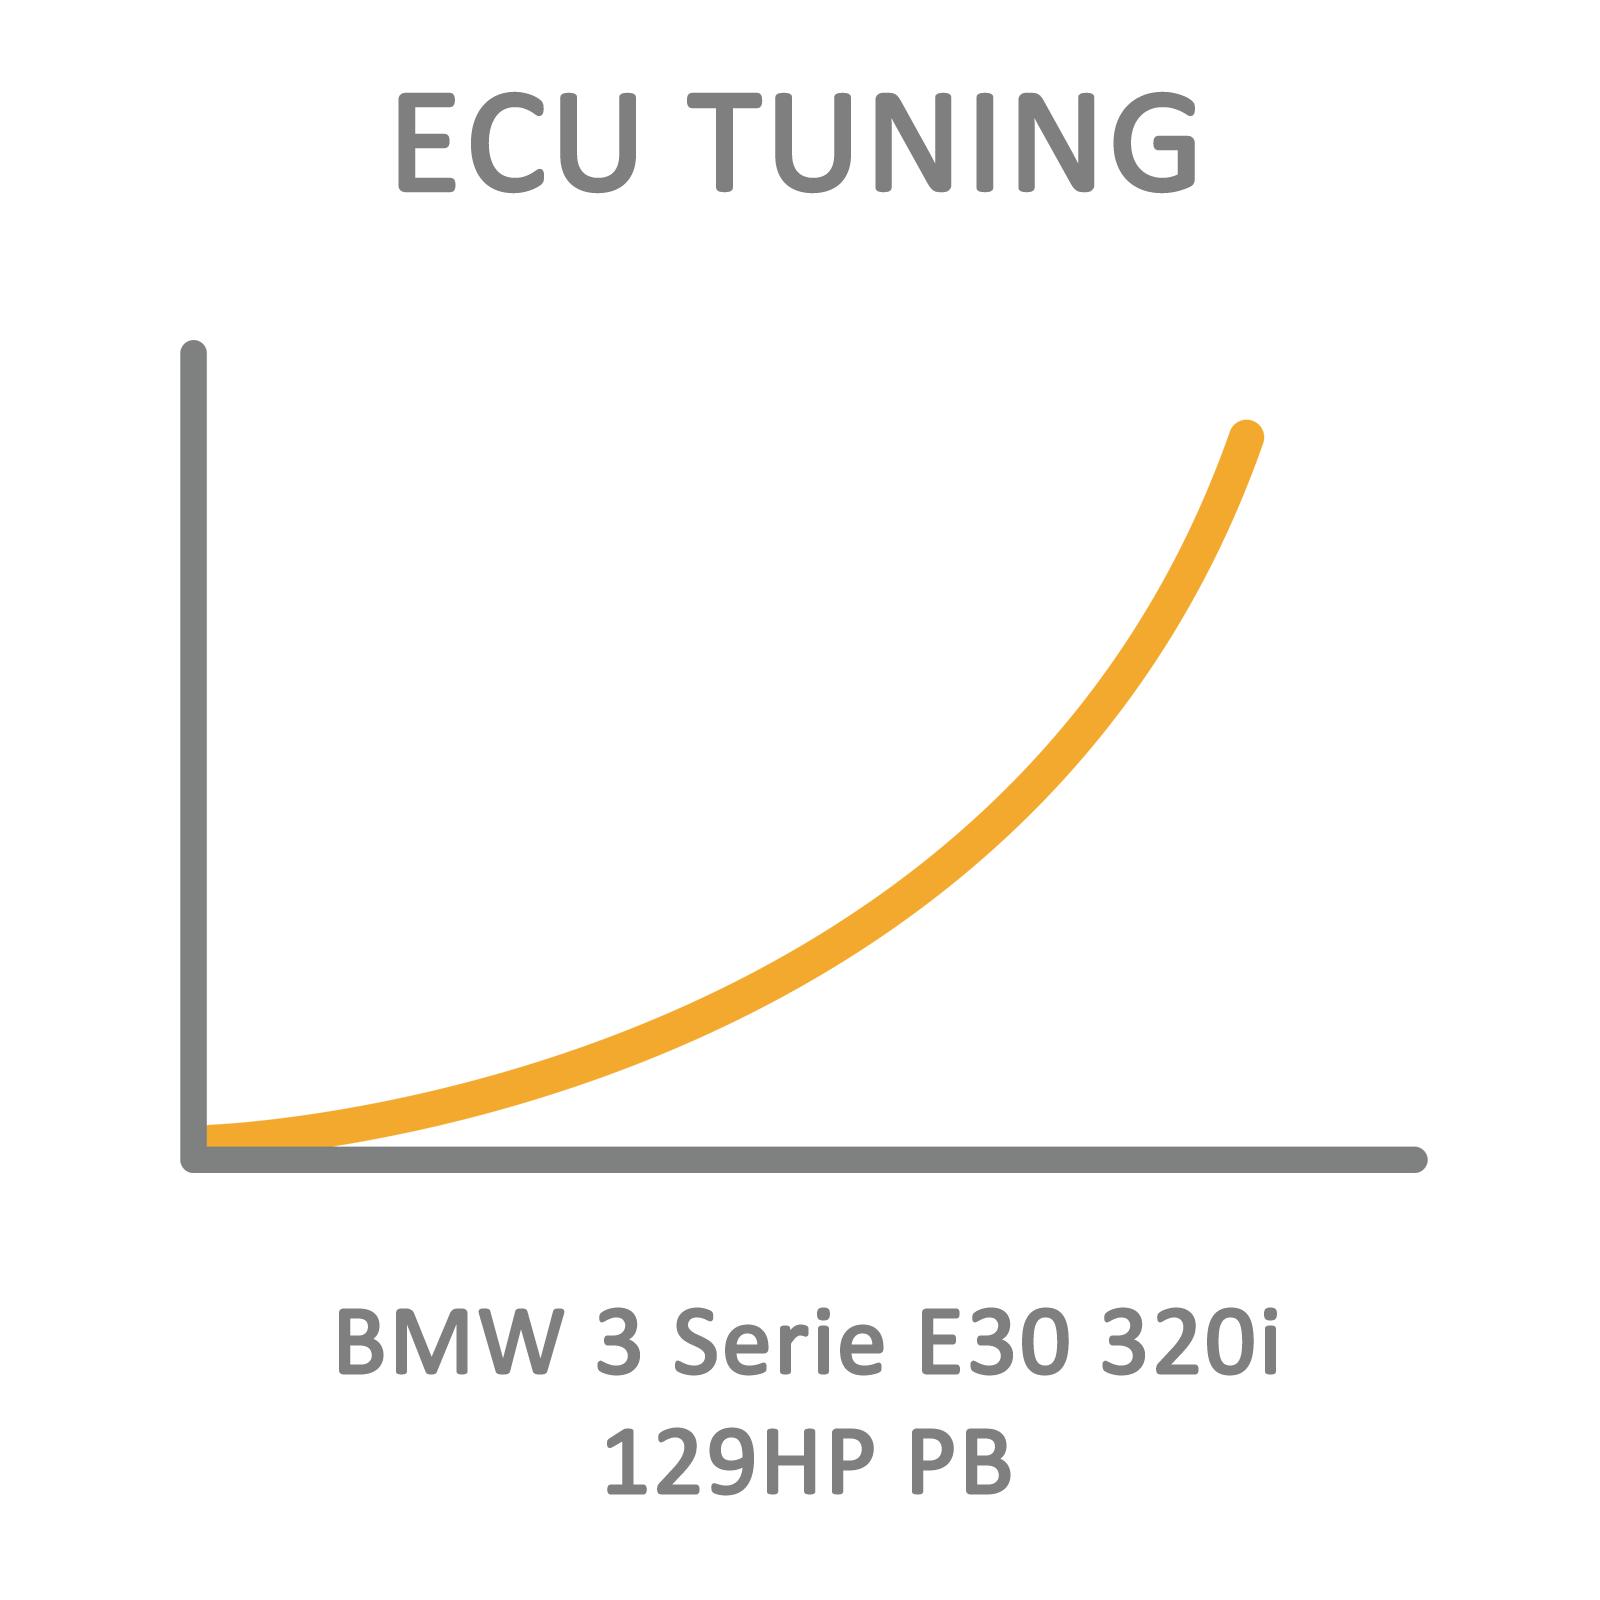 BMW 3 Series E30 320i 129HP PB ECU Tuning Remapping